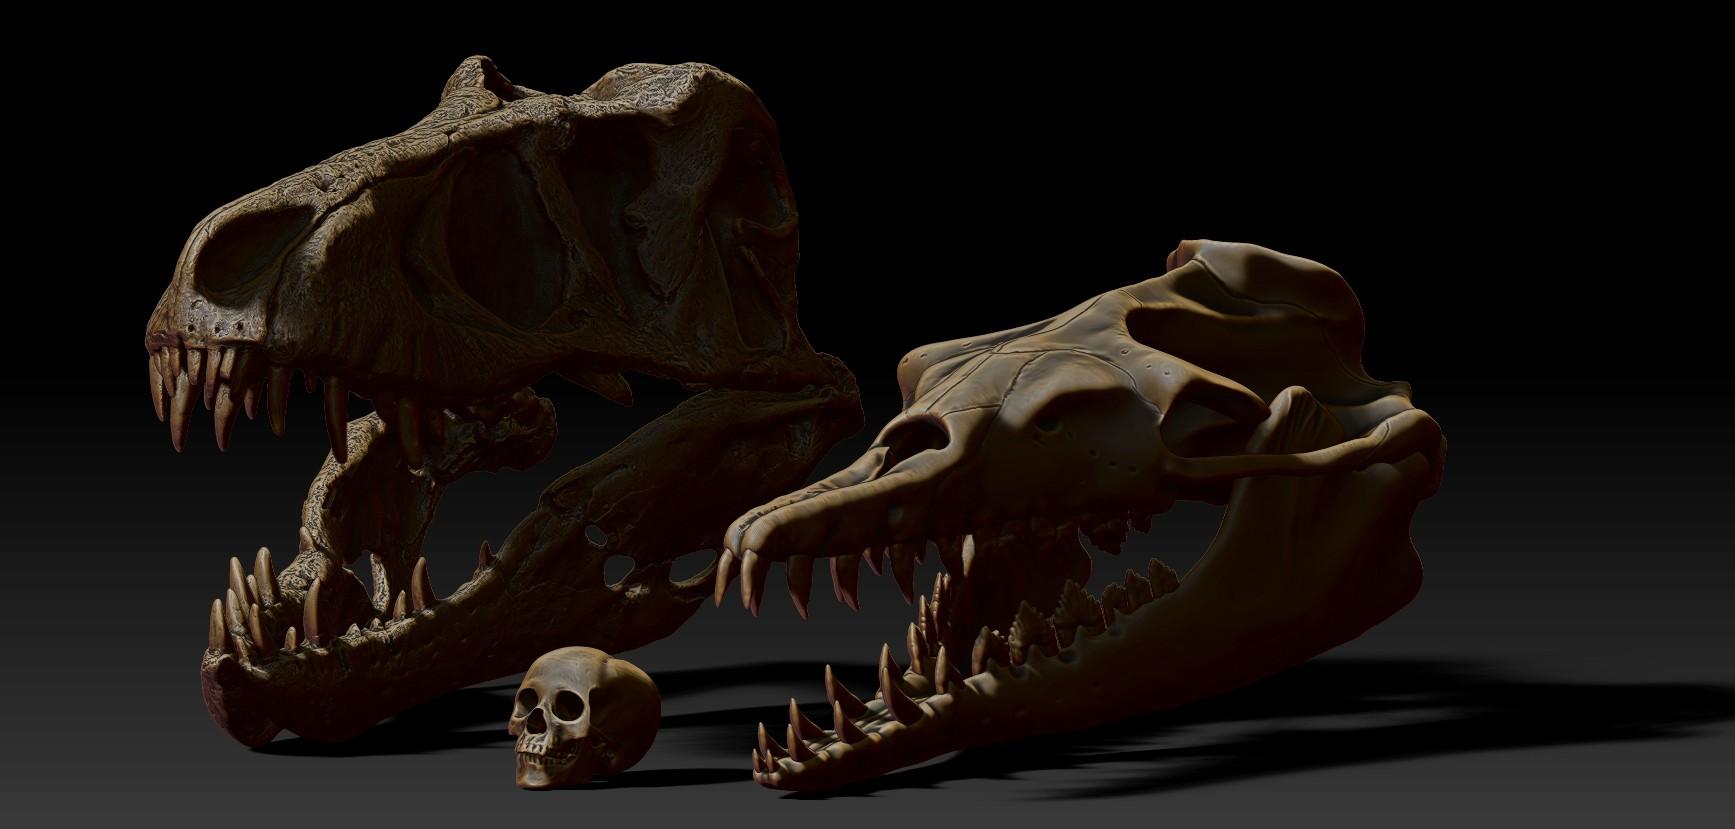 https://cdna.artstation.com/p/assets/images/images/004/148/864/large/jesse-pruitt-t-rex-basilosaurus-human.jpg?1480809432